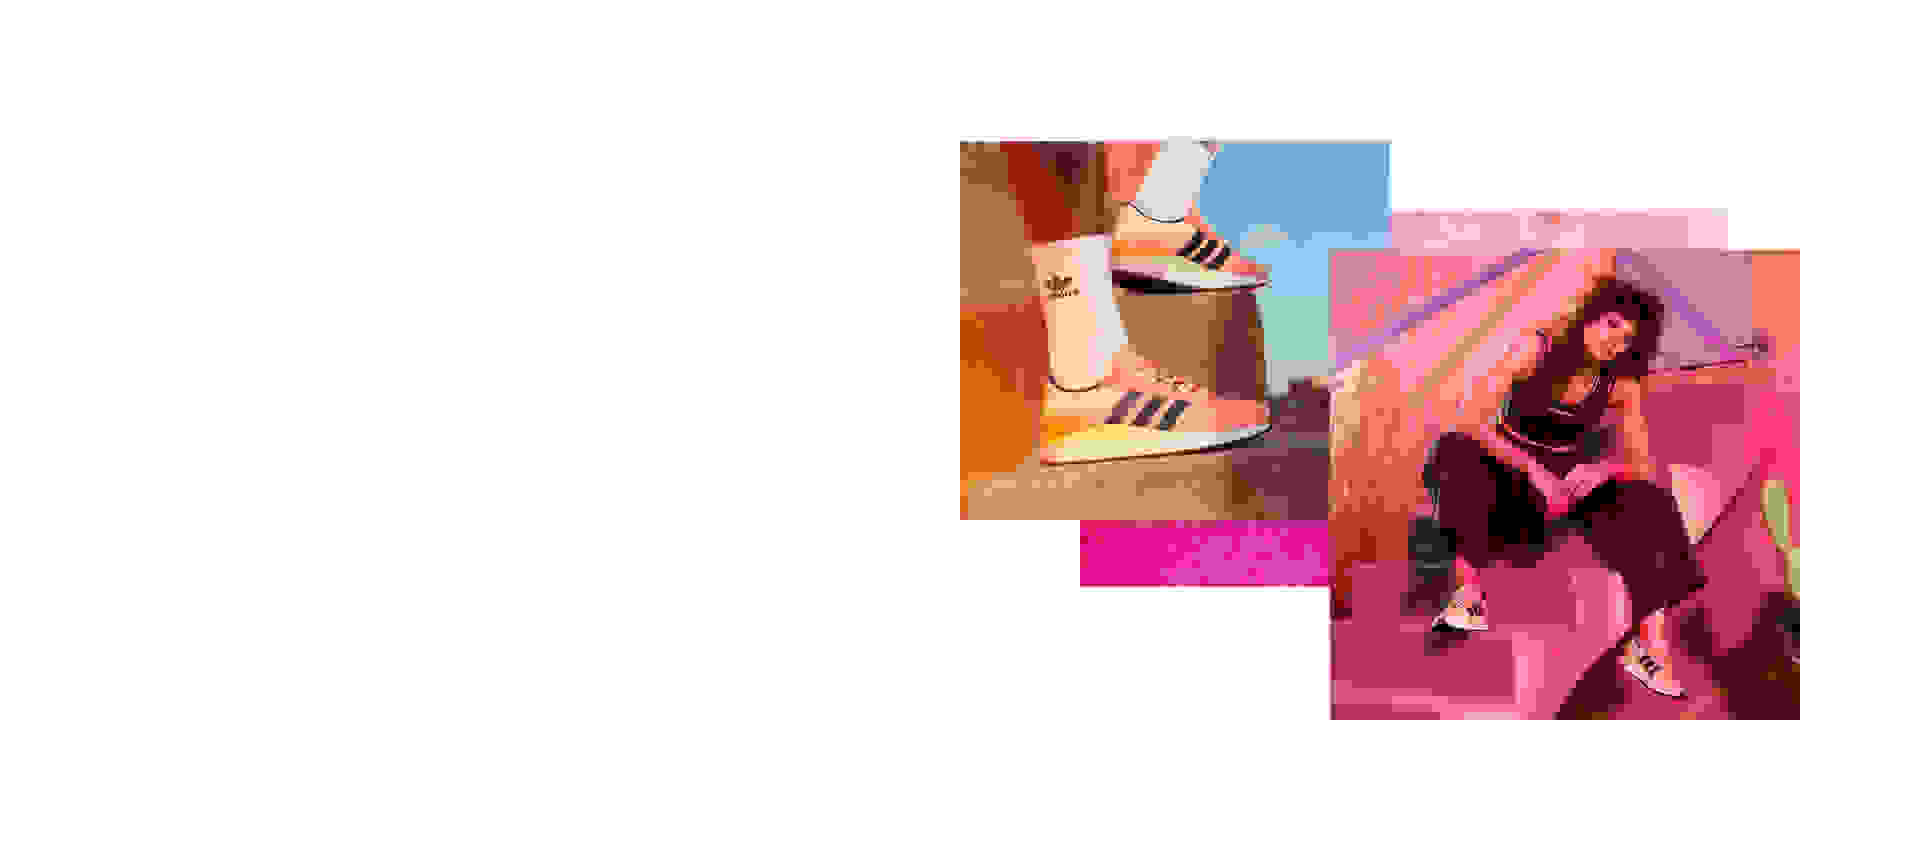 Details about Adidas Originals Xbyo Hoodie Burgundy Women Pullover New Japan CD2607